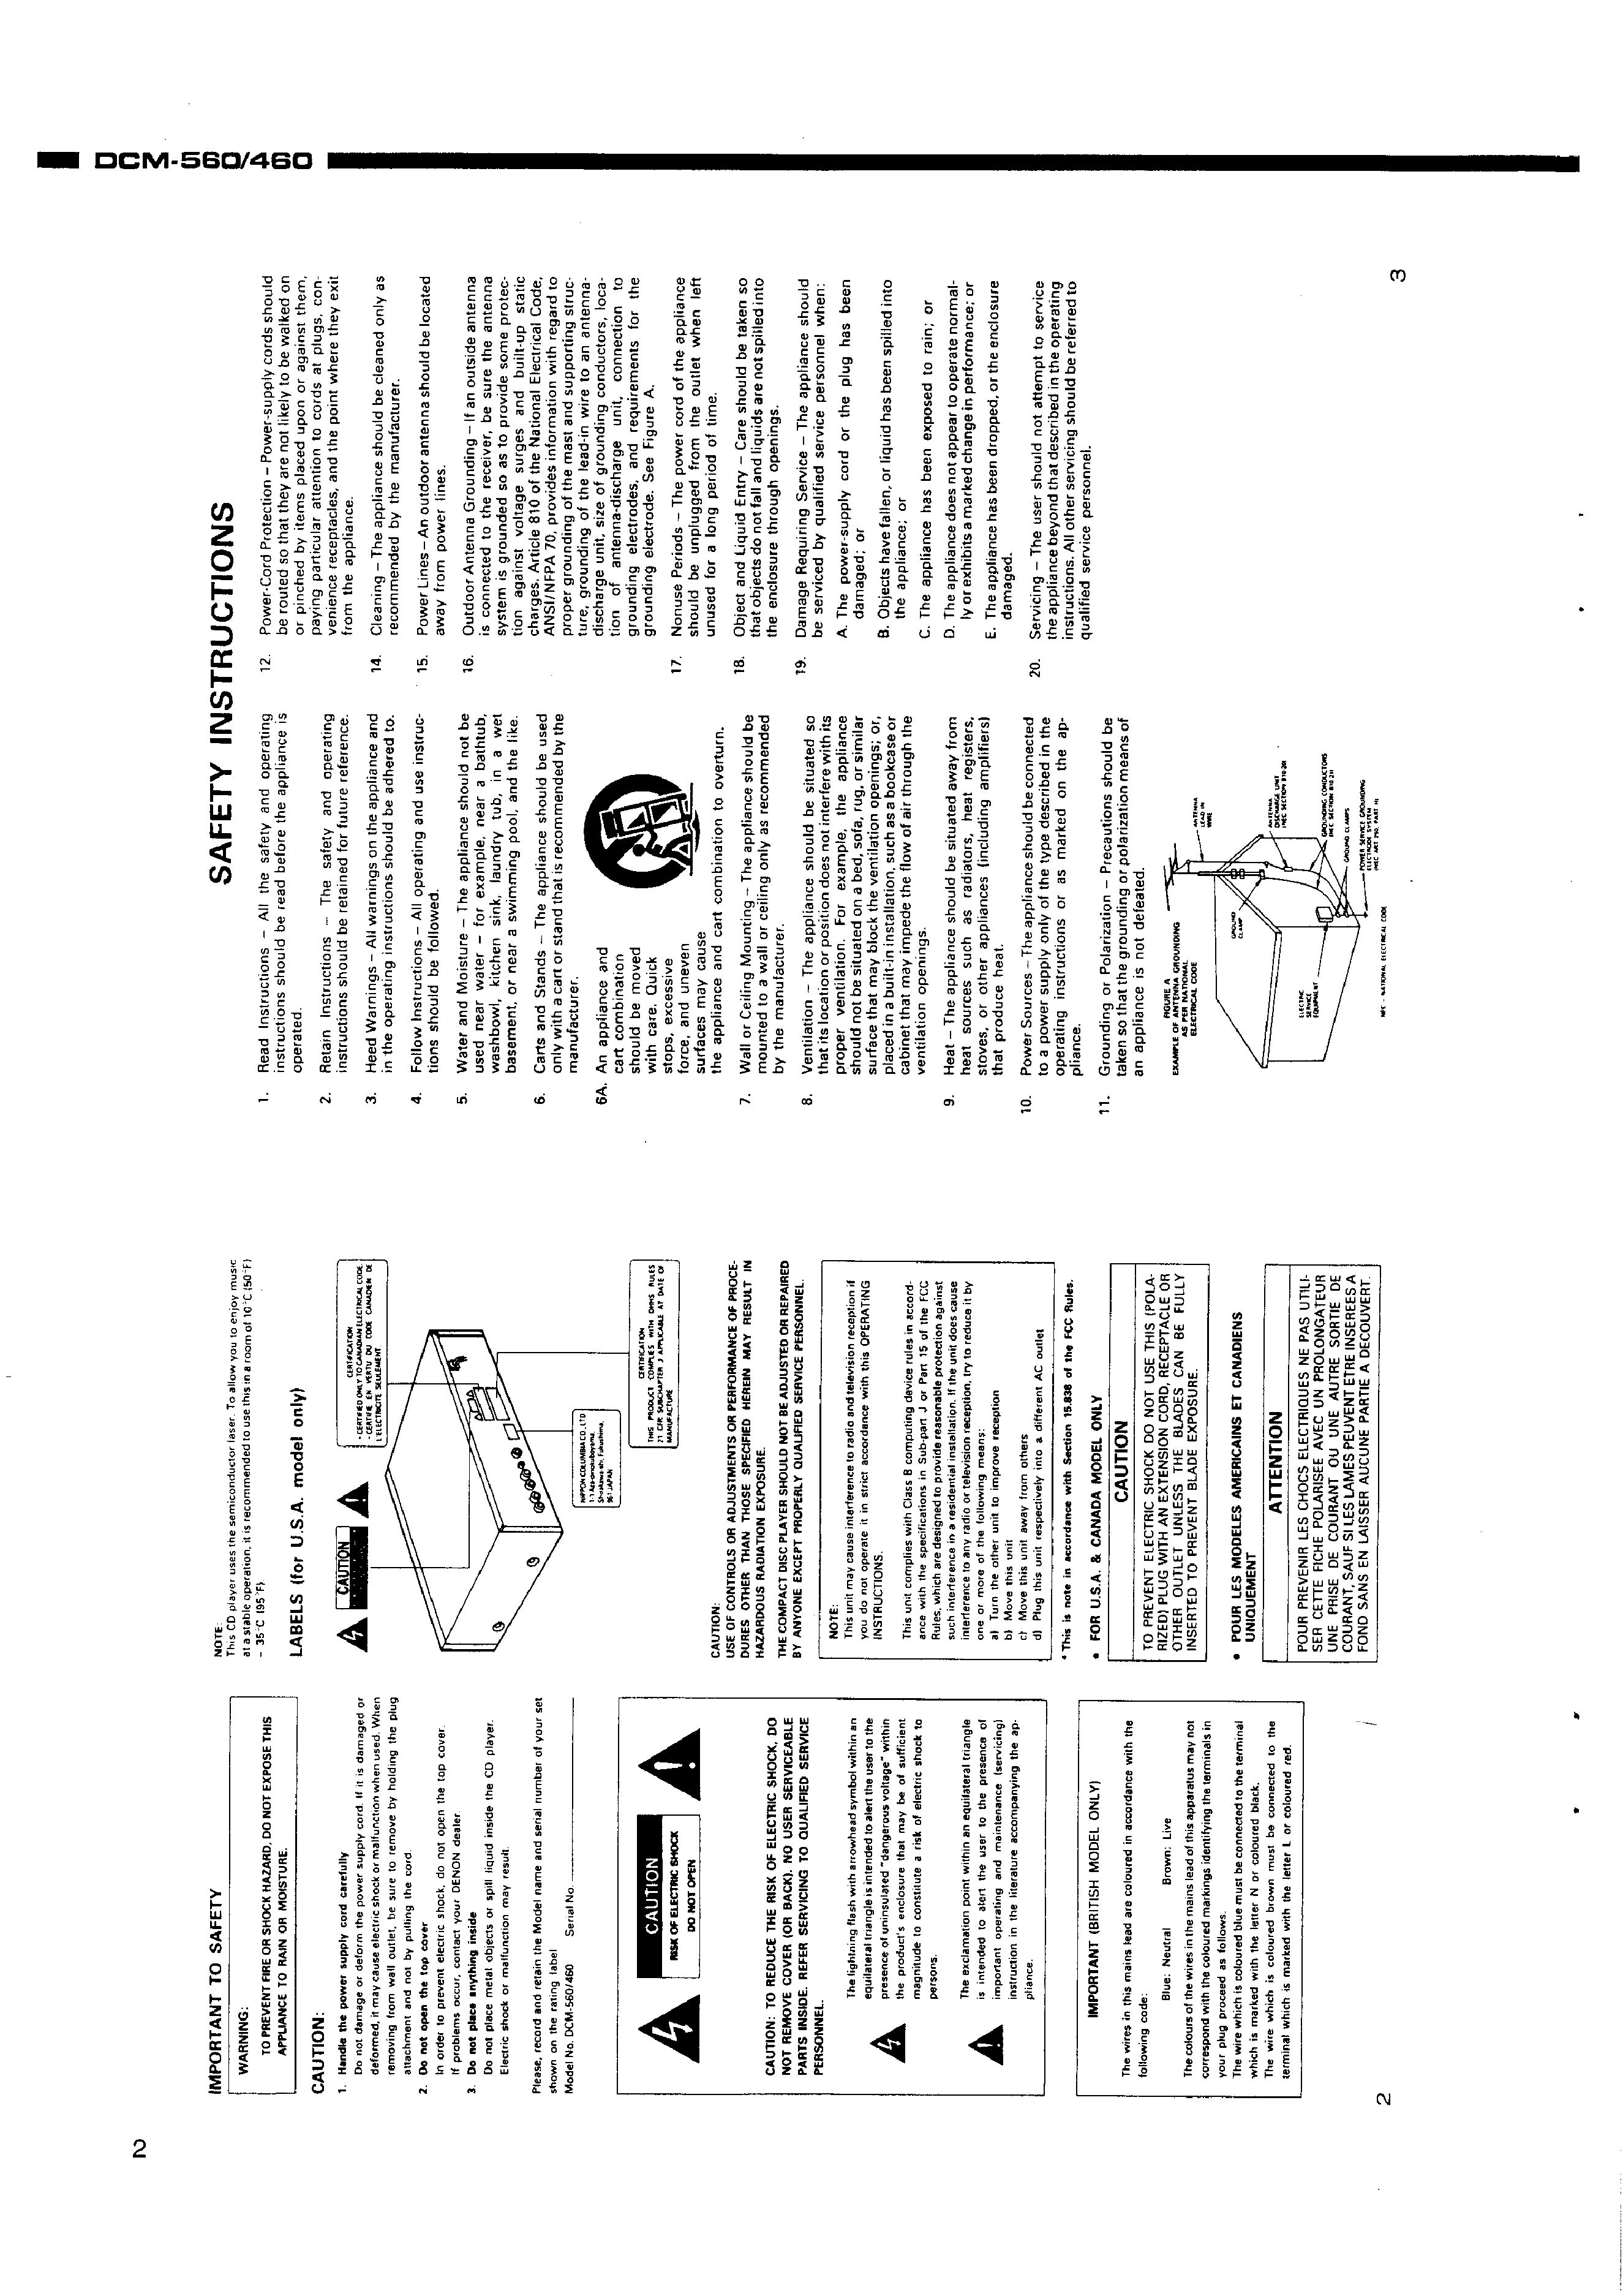 service manual for denon dcm-560